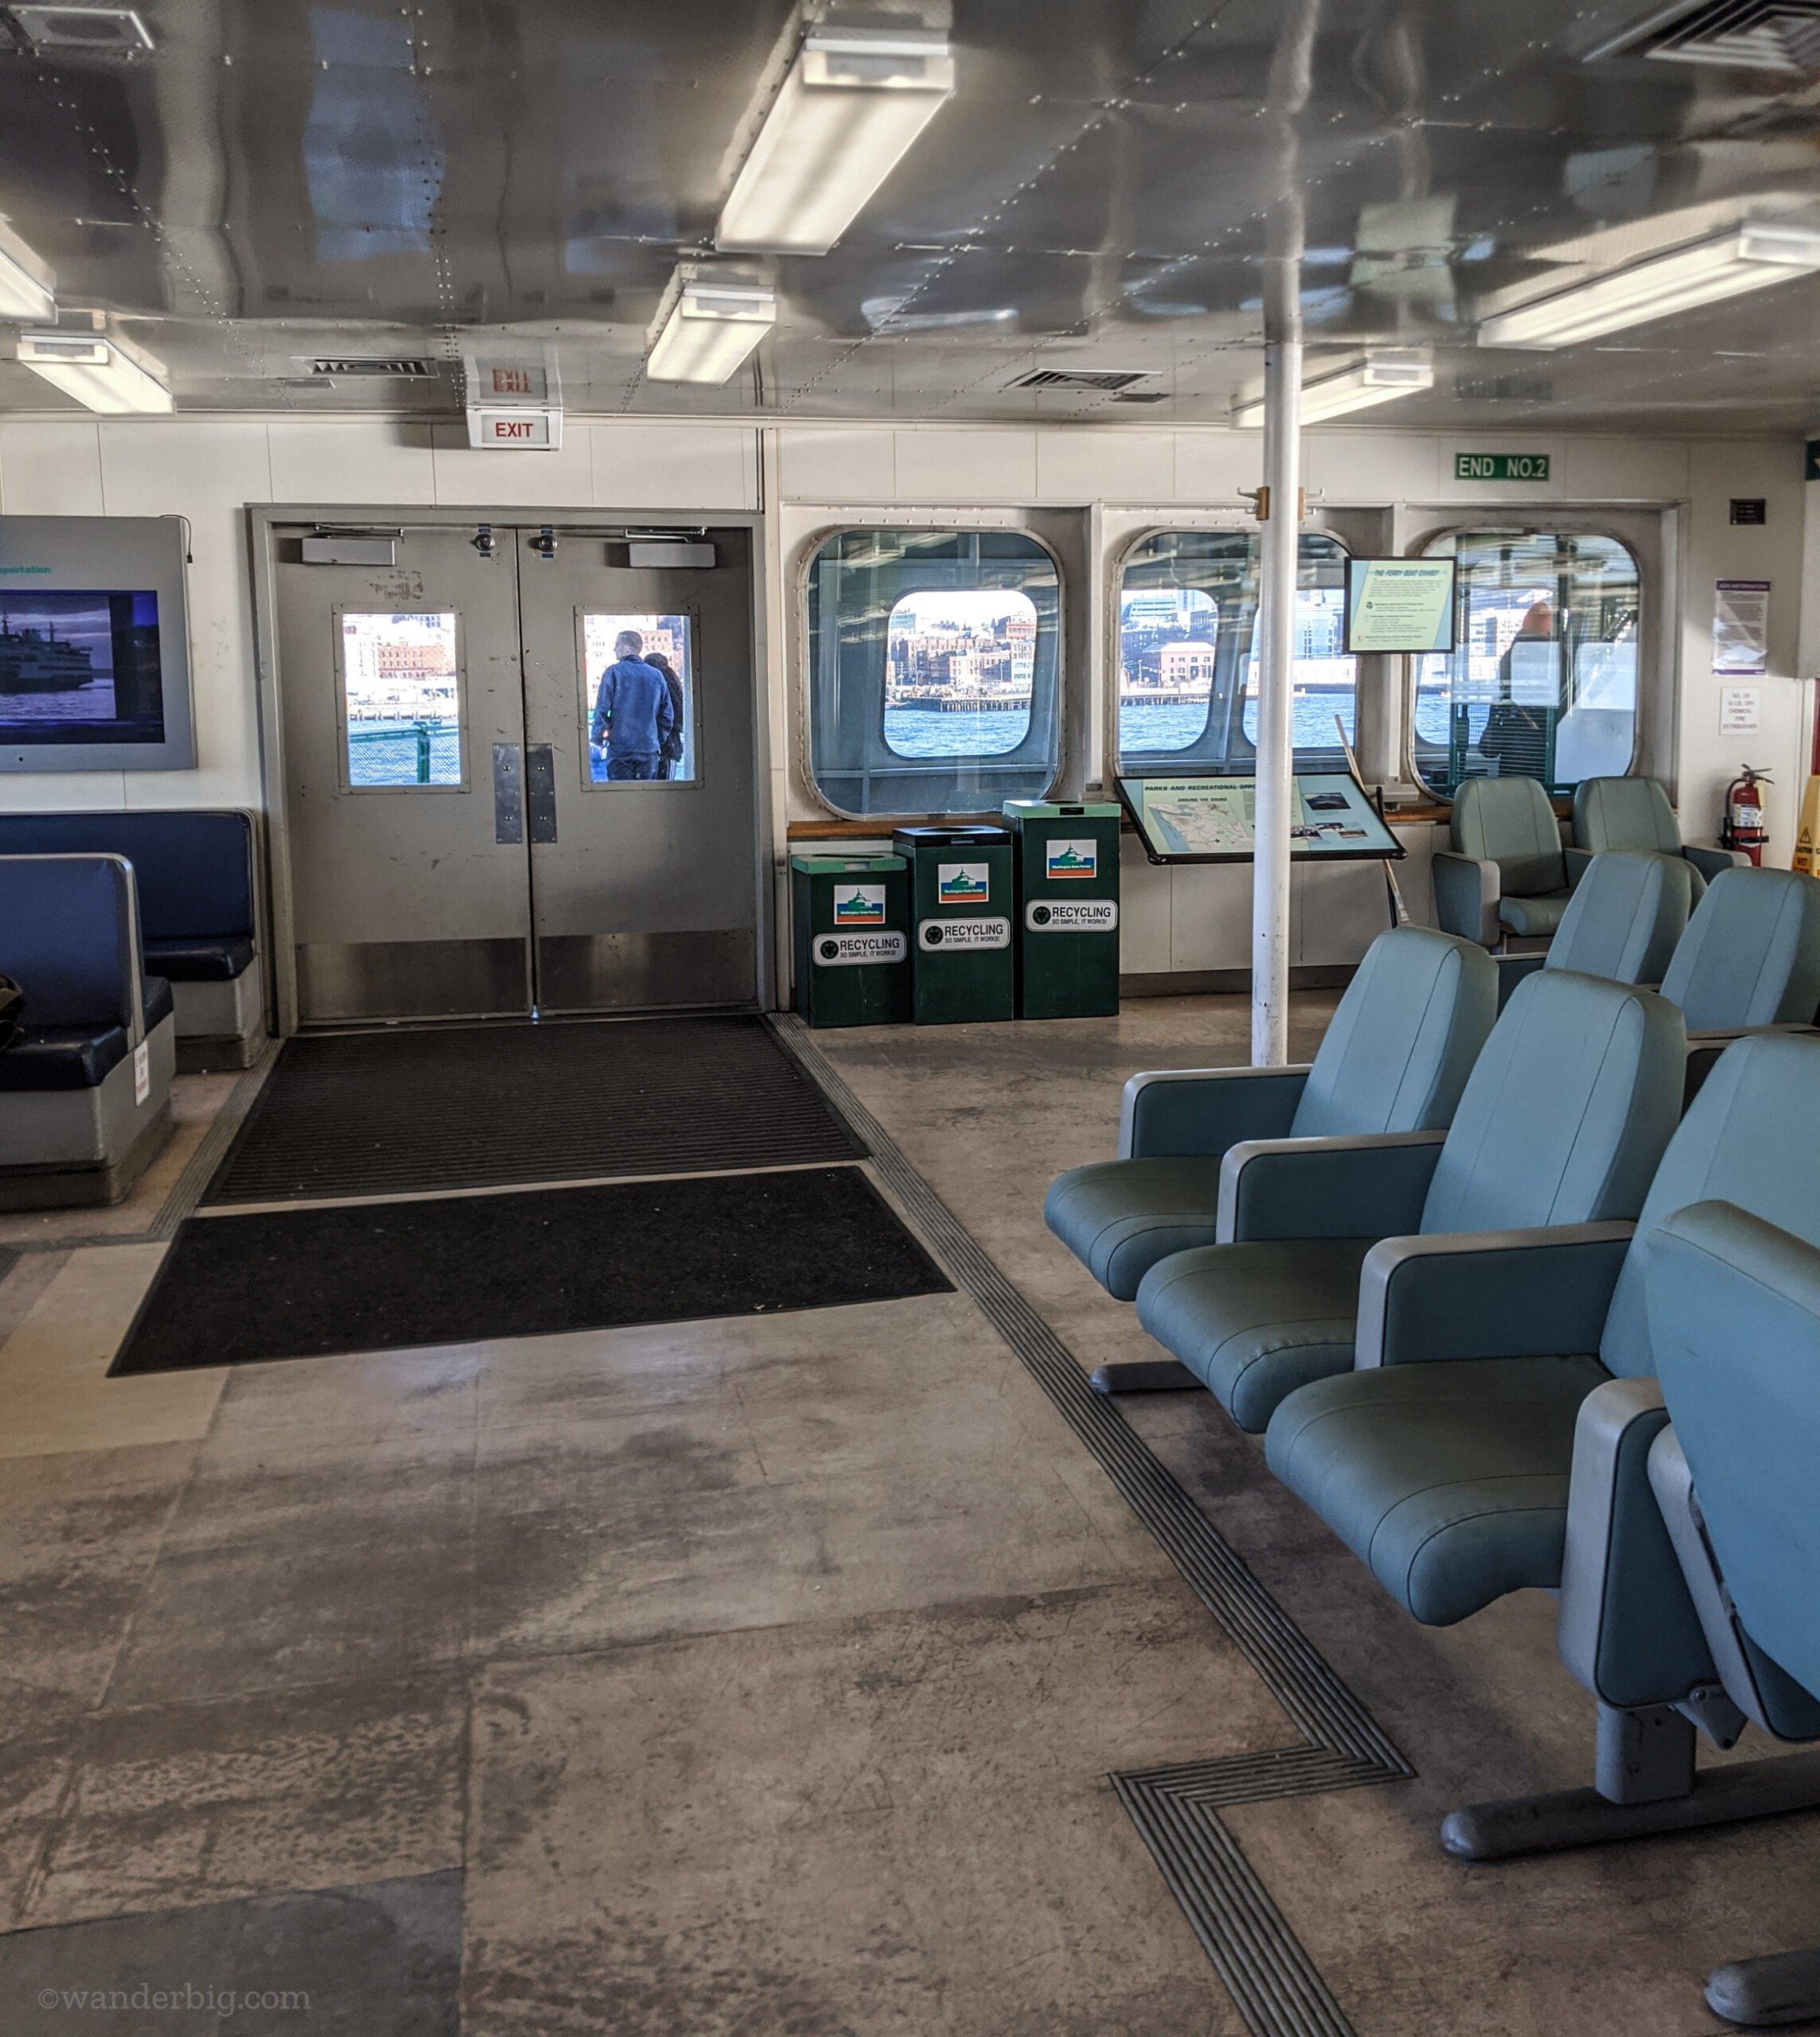 The main passenger deck of the bainbridge to seattle ferry.